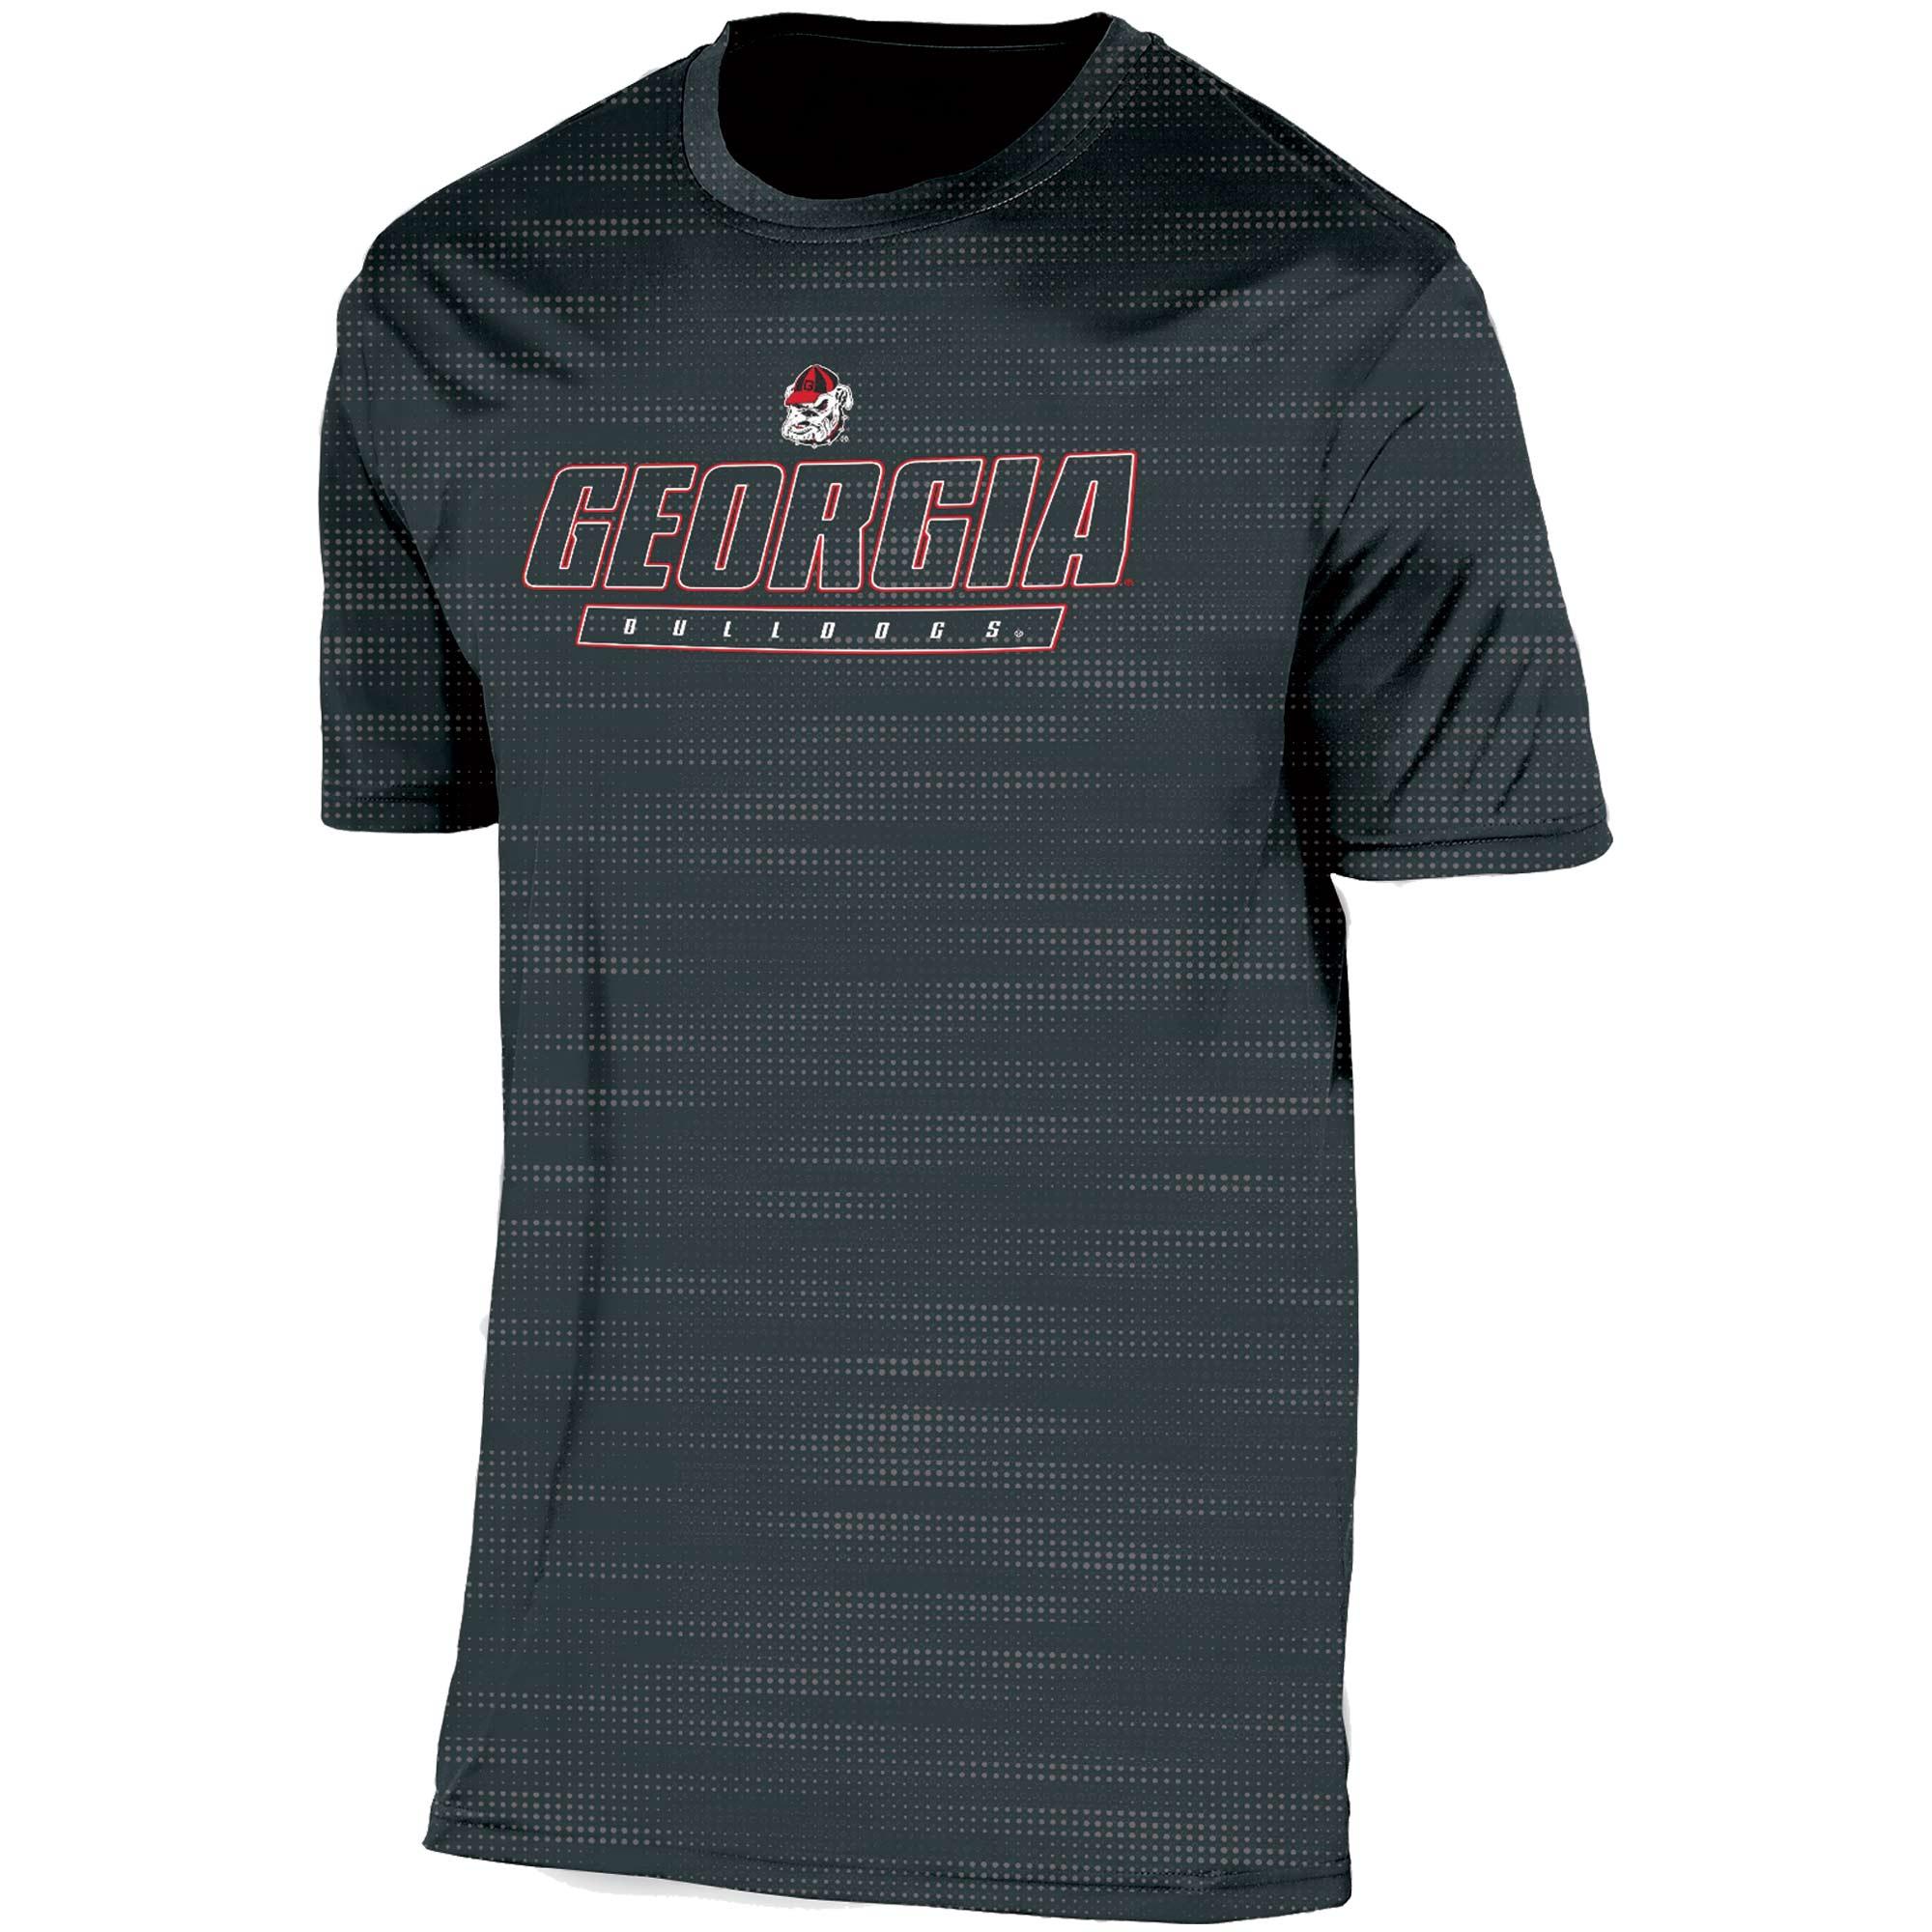 Men's Russell Black Georgia Bulldogs Embossed Synthetic T-Shirt